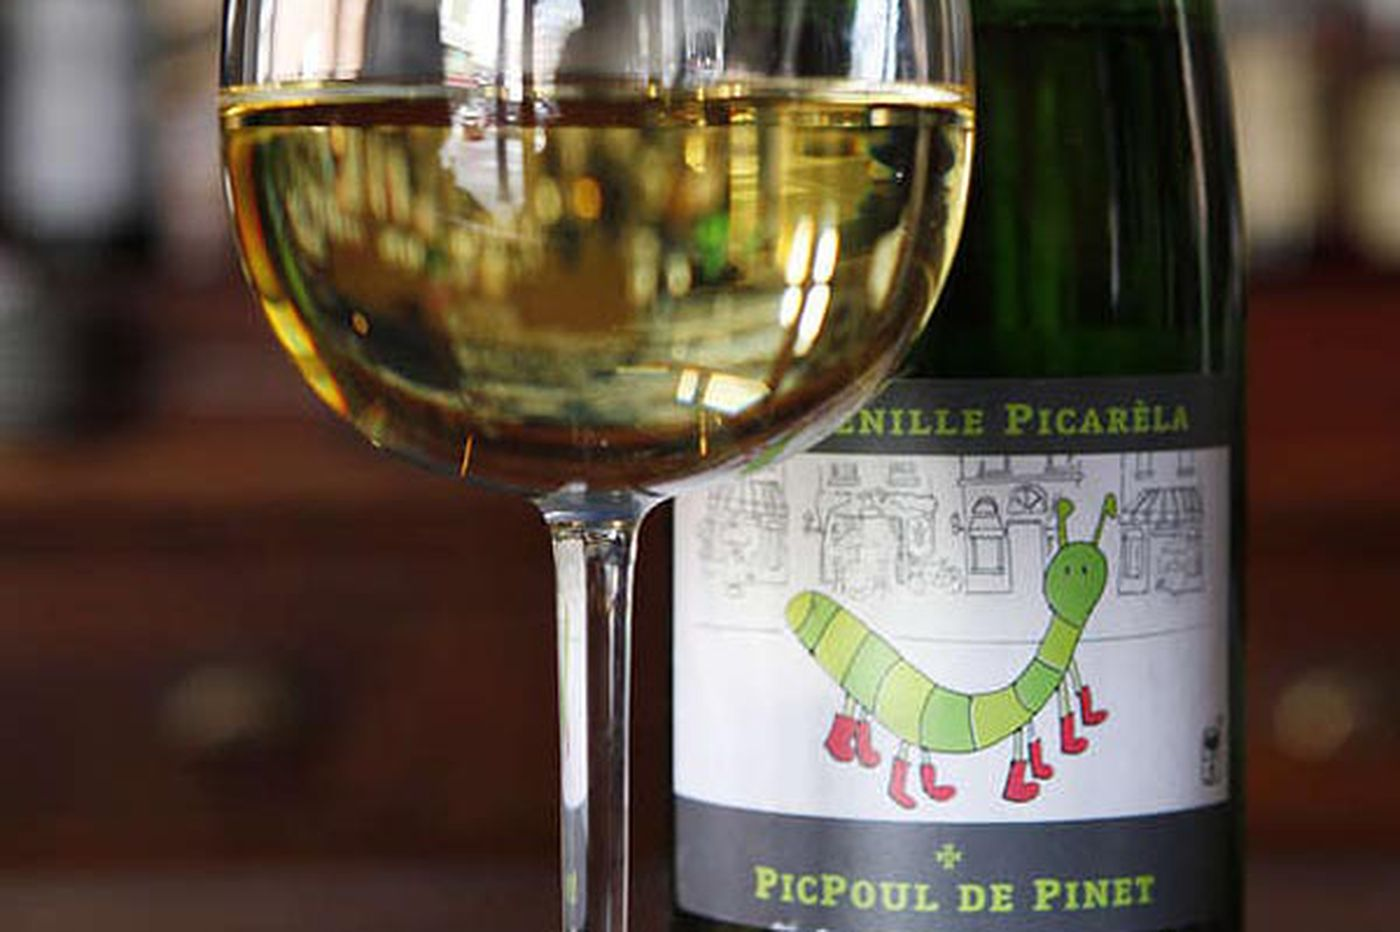 Drink: La Chenille Picarela Picpoul de Pinet